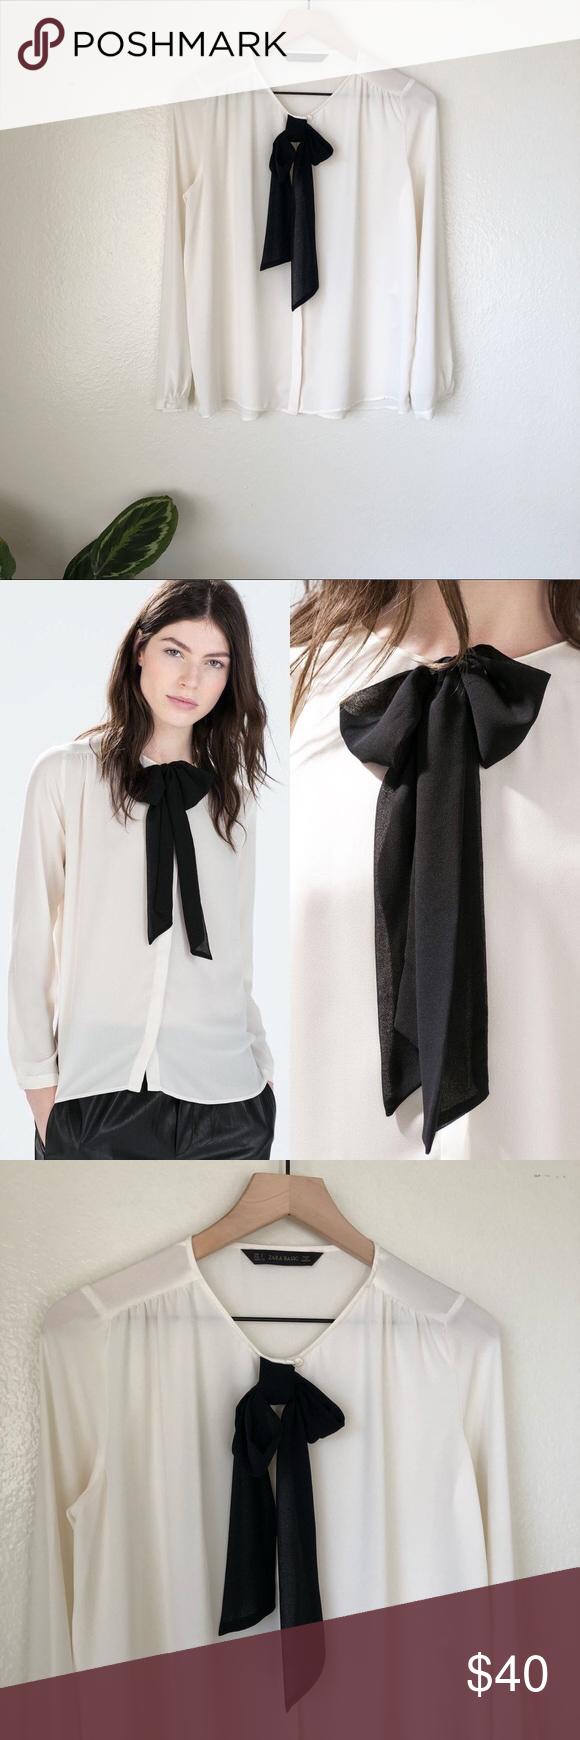 36027b5a2c9 Zara | Bow Blouse Zara Bow Blouse -cream with black tie bow -button ...